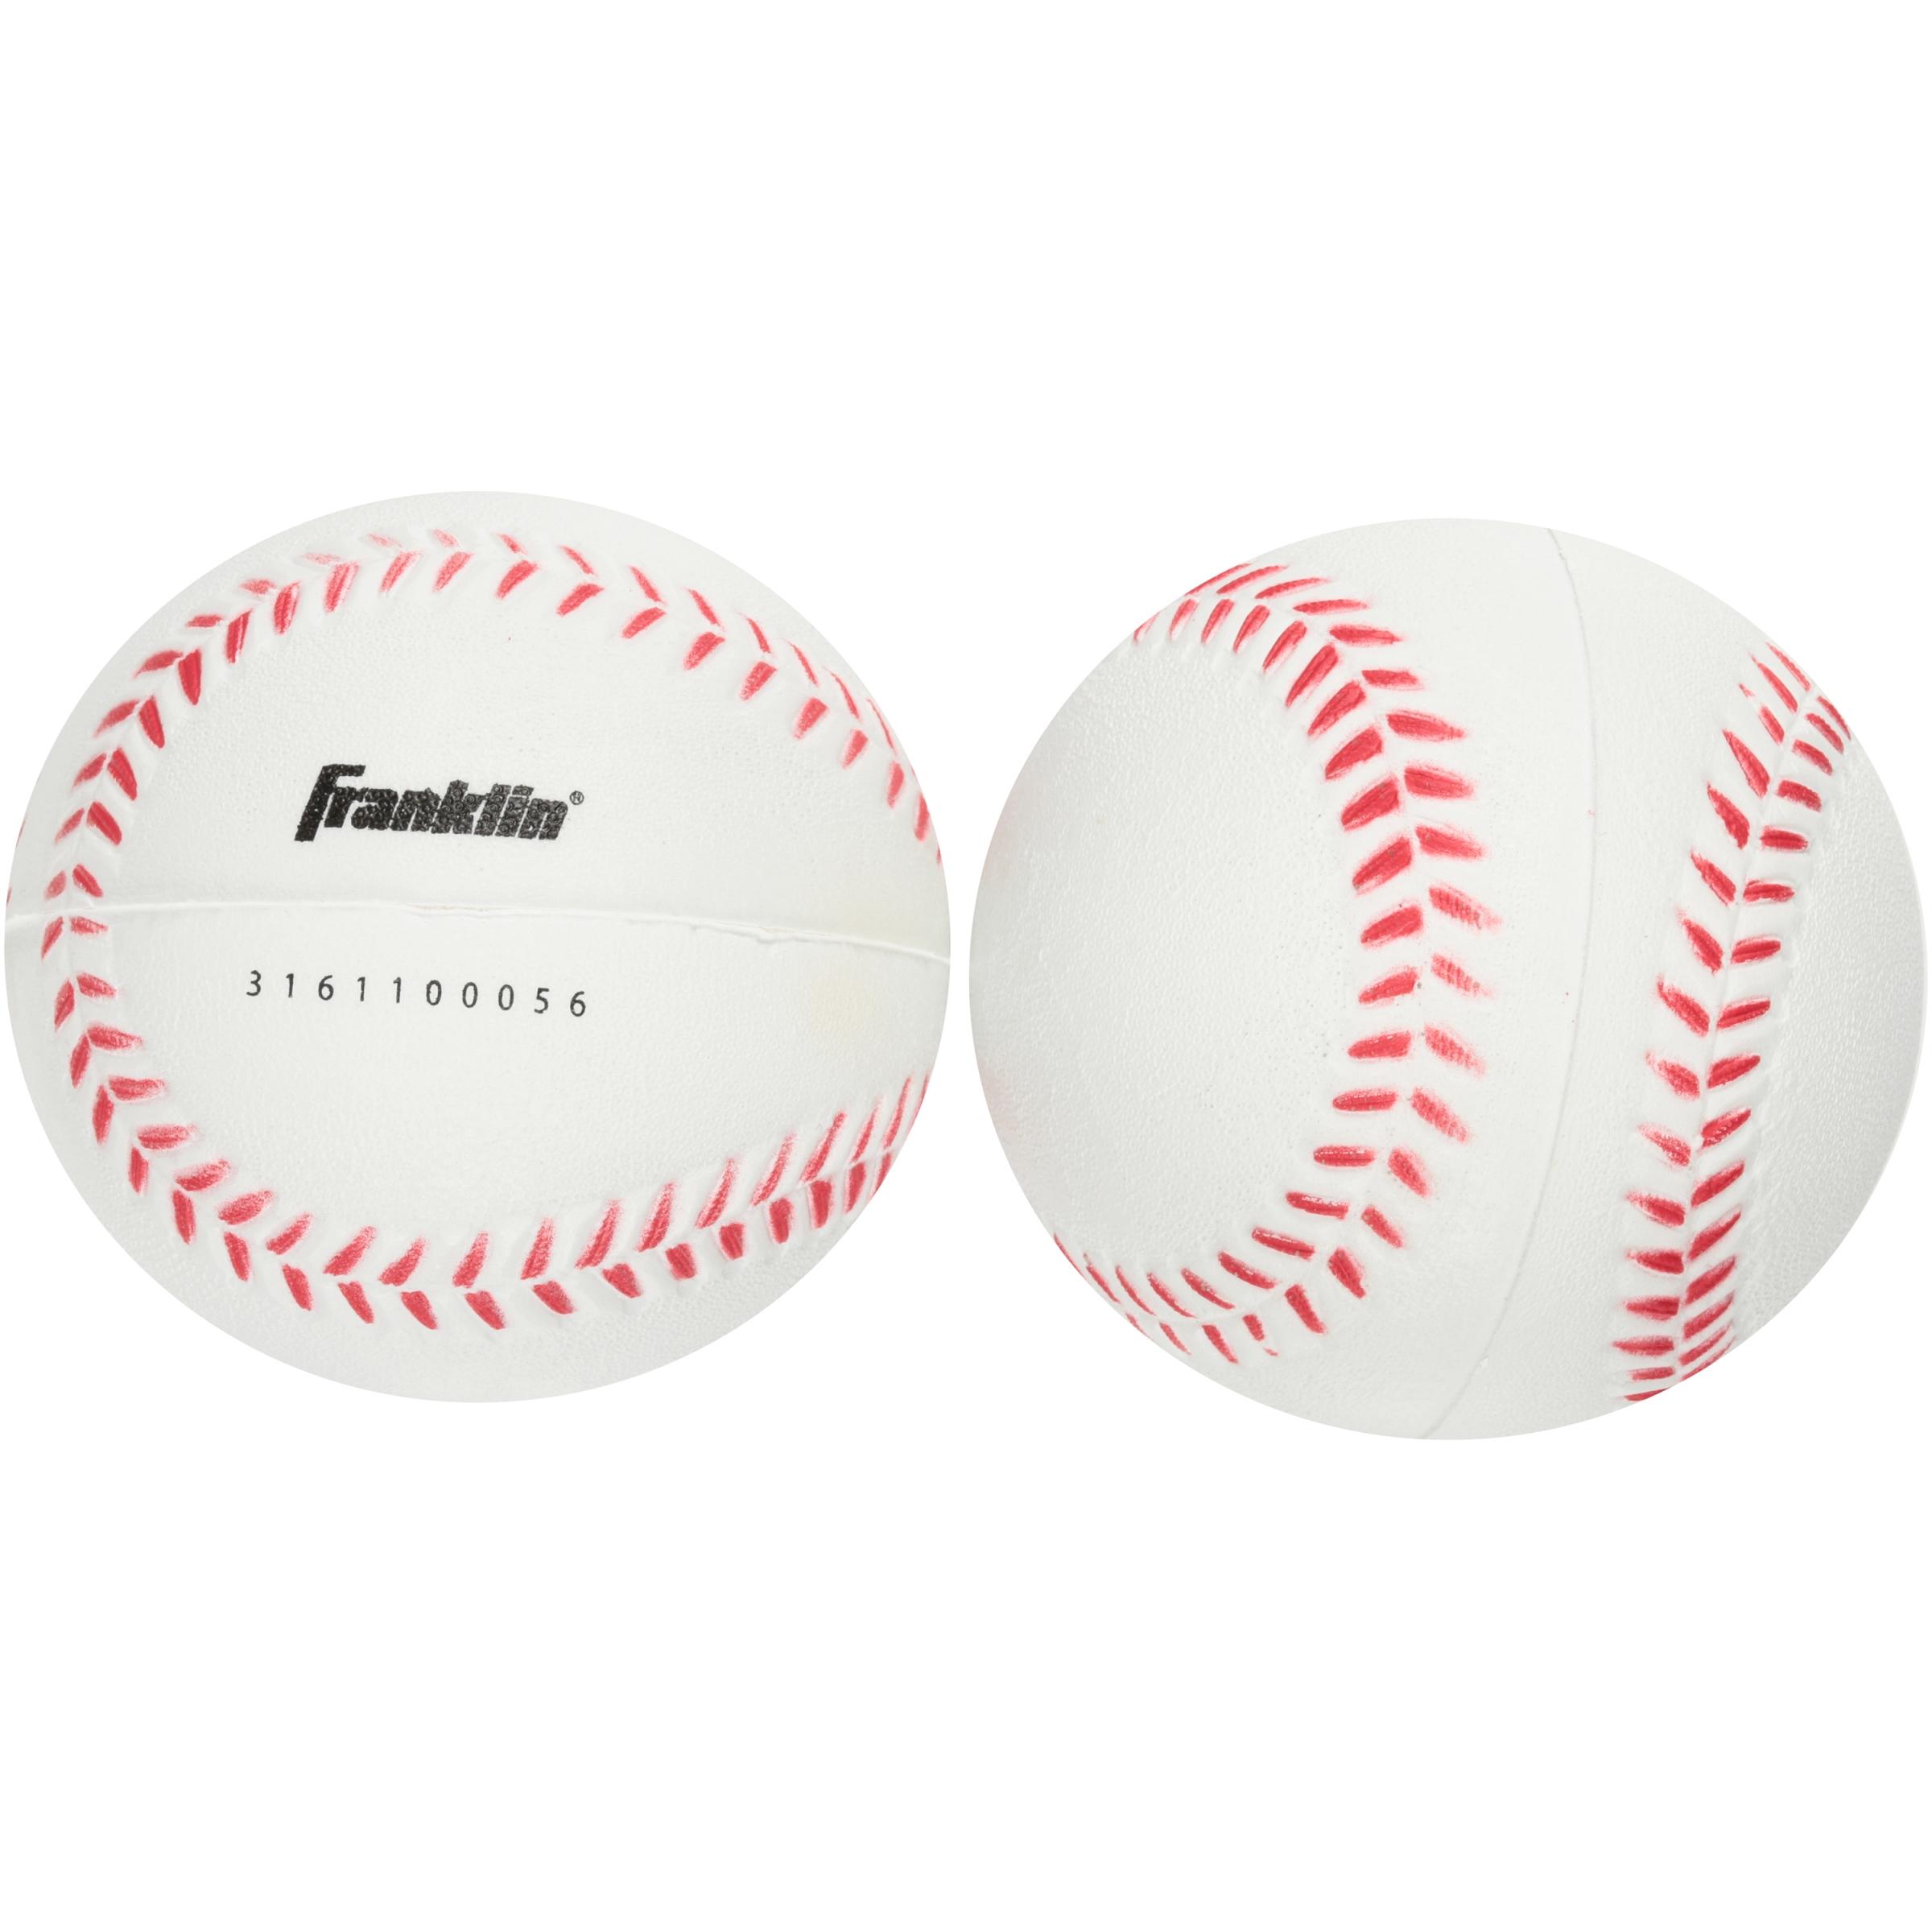 Franklin MLB® Foam Baseballs 2 ct Pack